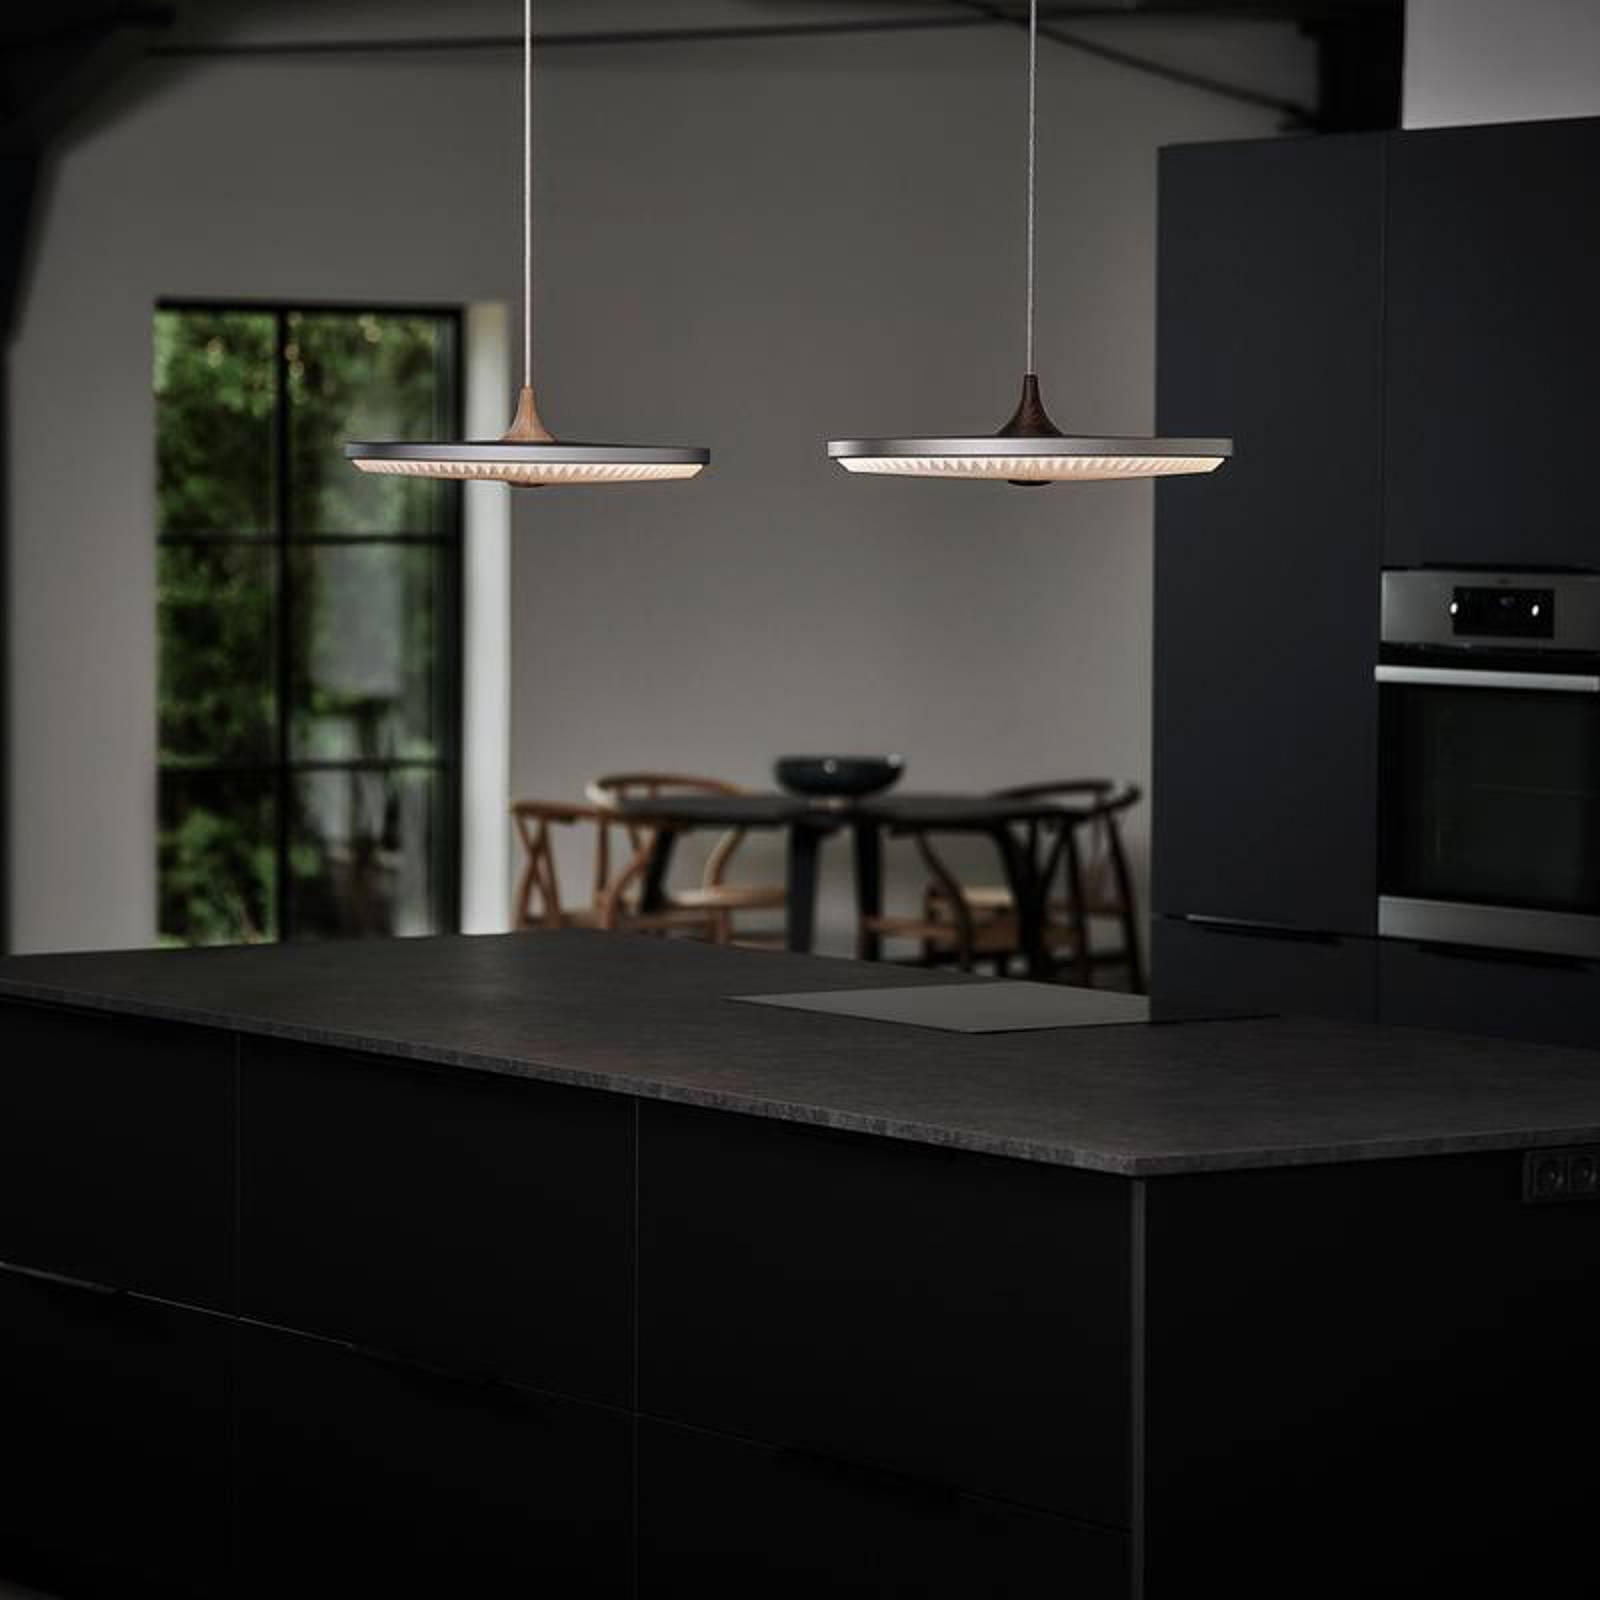 LE KLINT Soleil hanglamp donkergrijs Ø50cm dimbaar